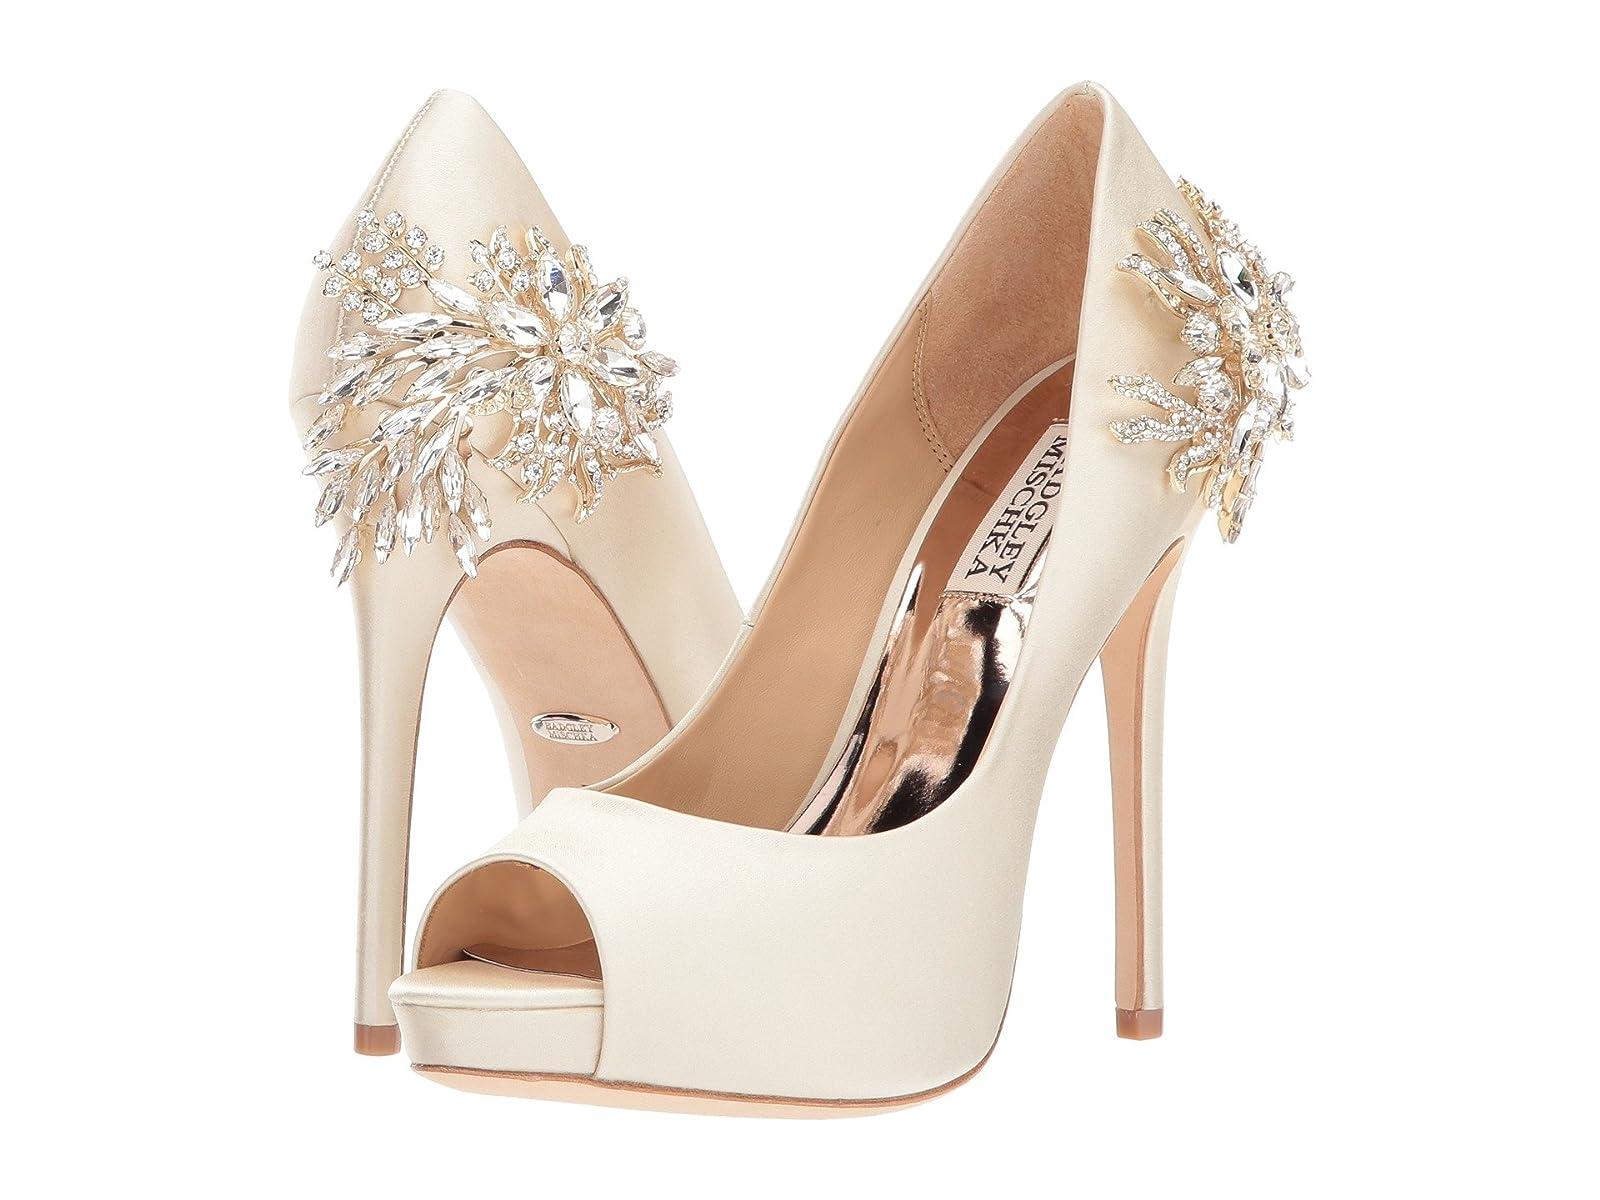 Badgley Mischka MarciaCheap and distinctive eye-catching shoes